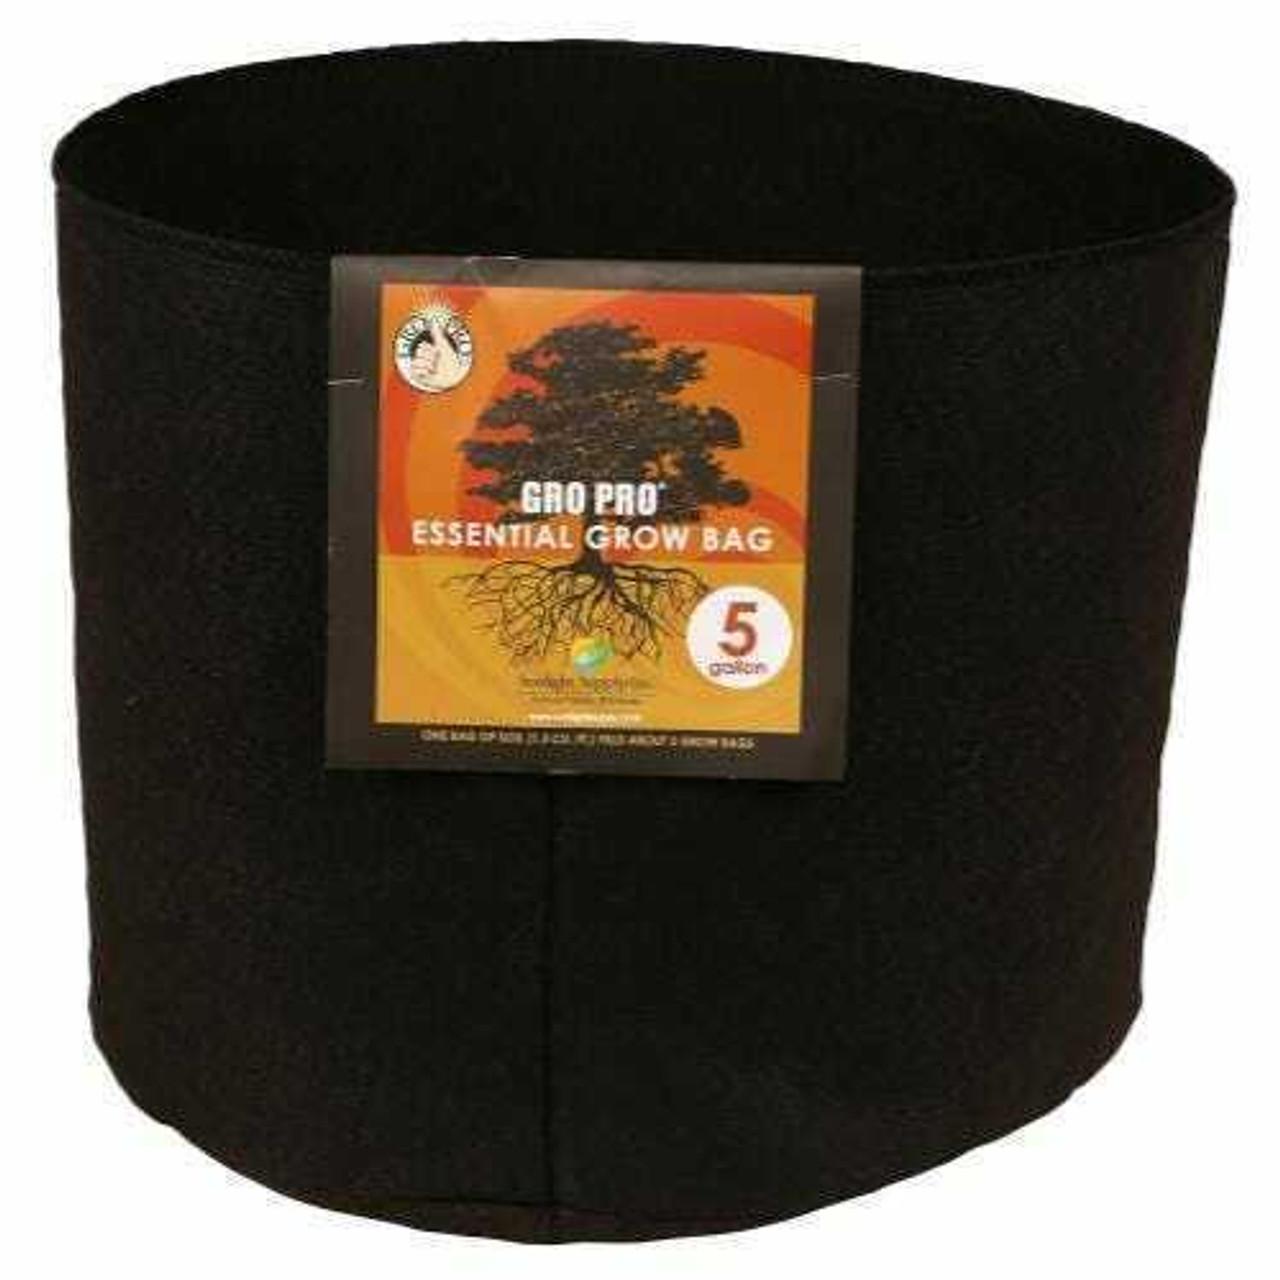 Gro Pro Essential Round Fabric Pot - Black 5 Gallon - 1